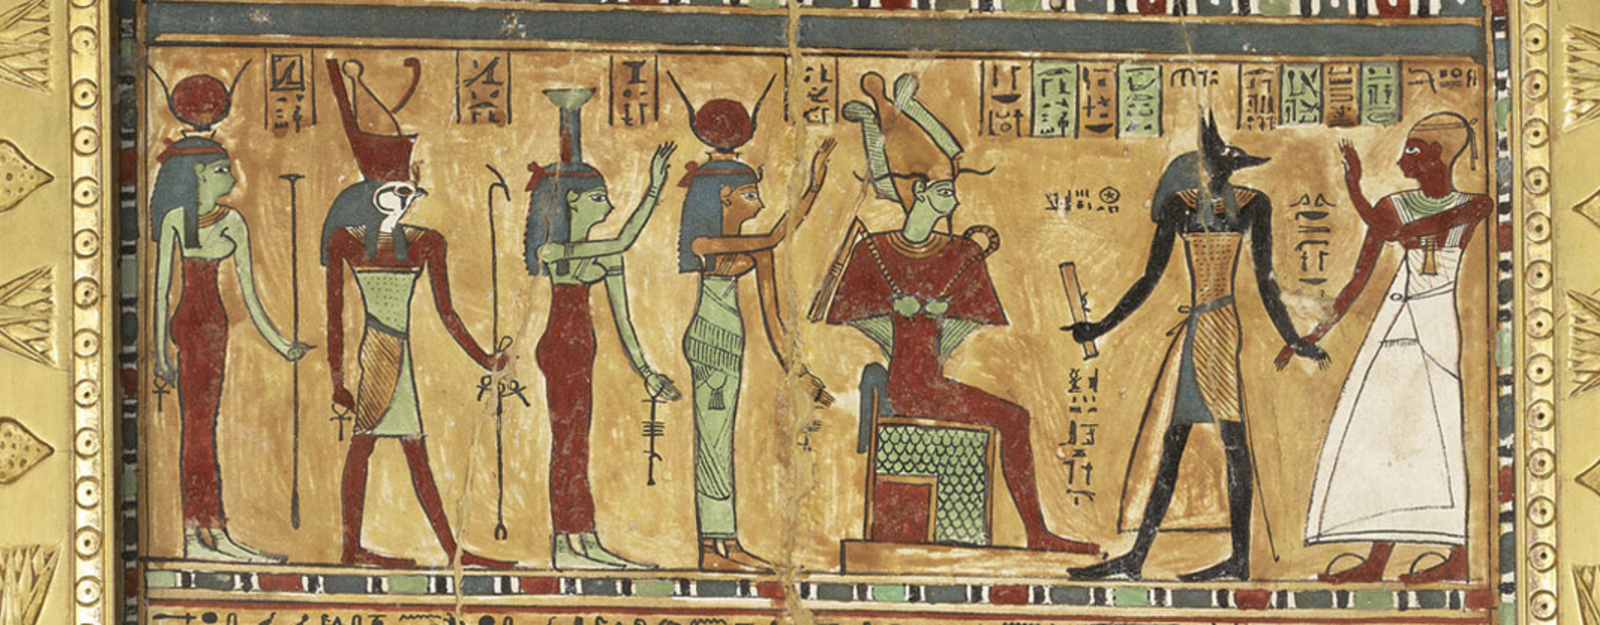 Hieroglyphs on an Egyptian funerary stela